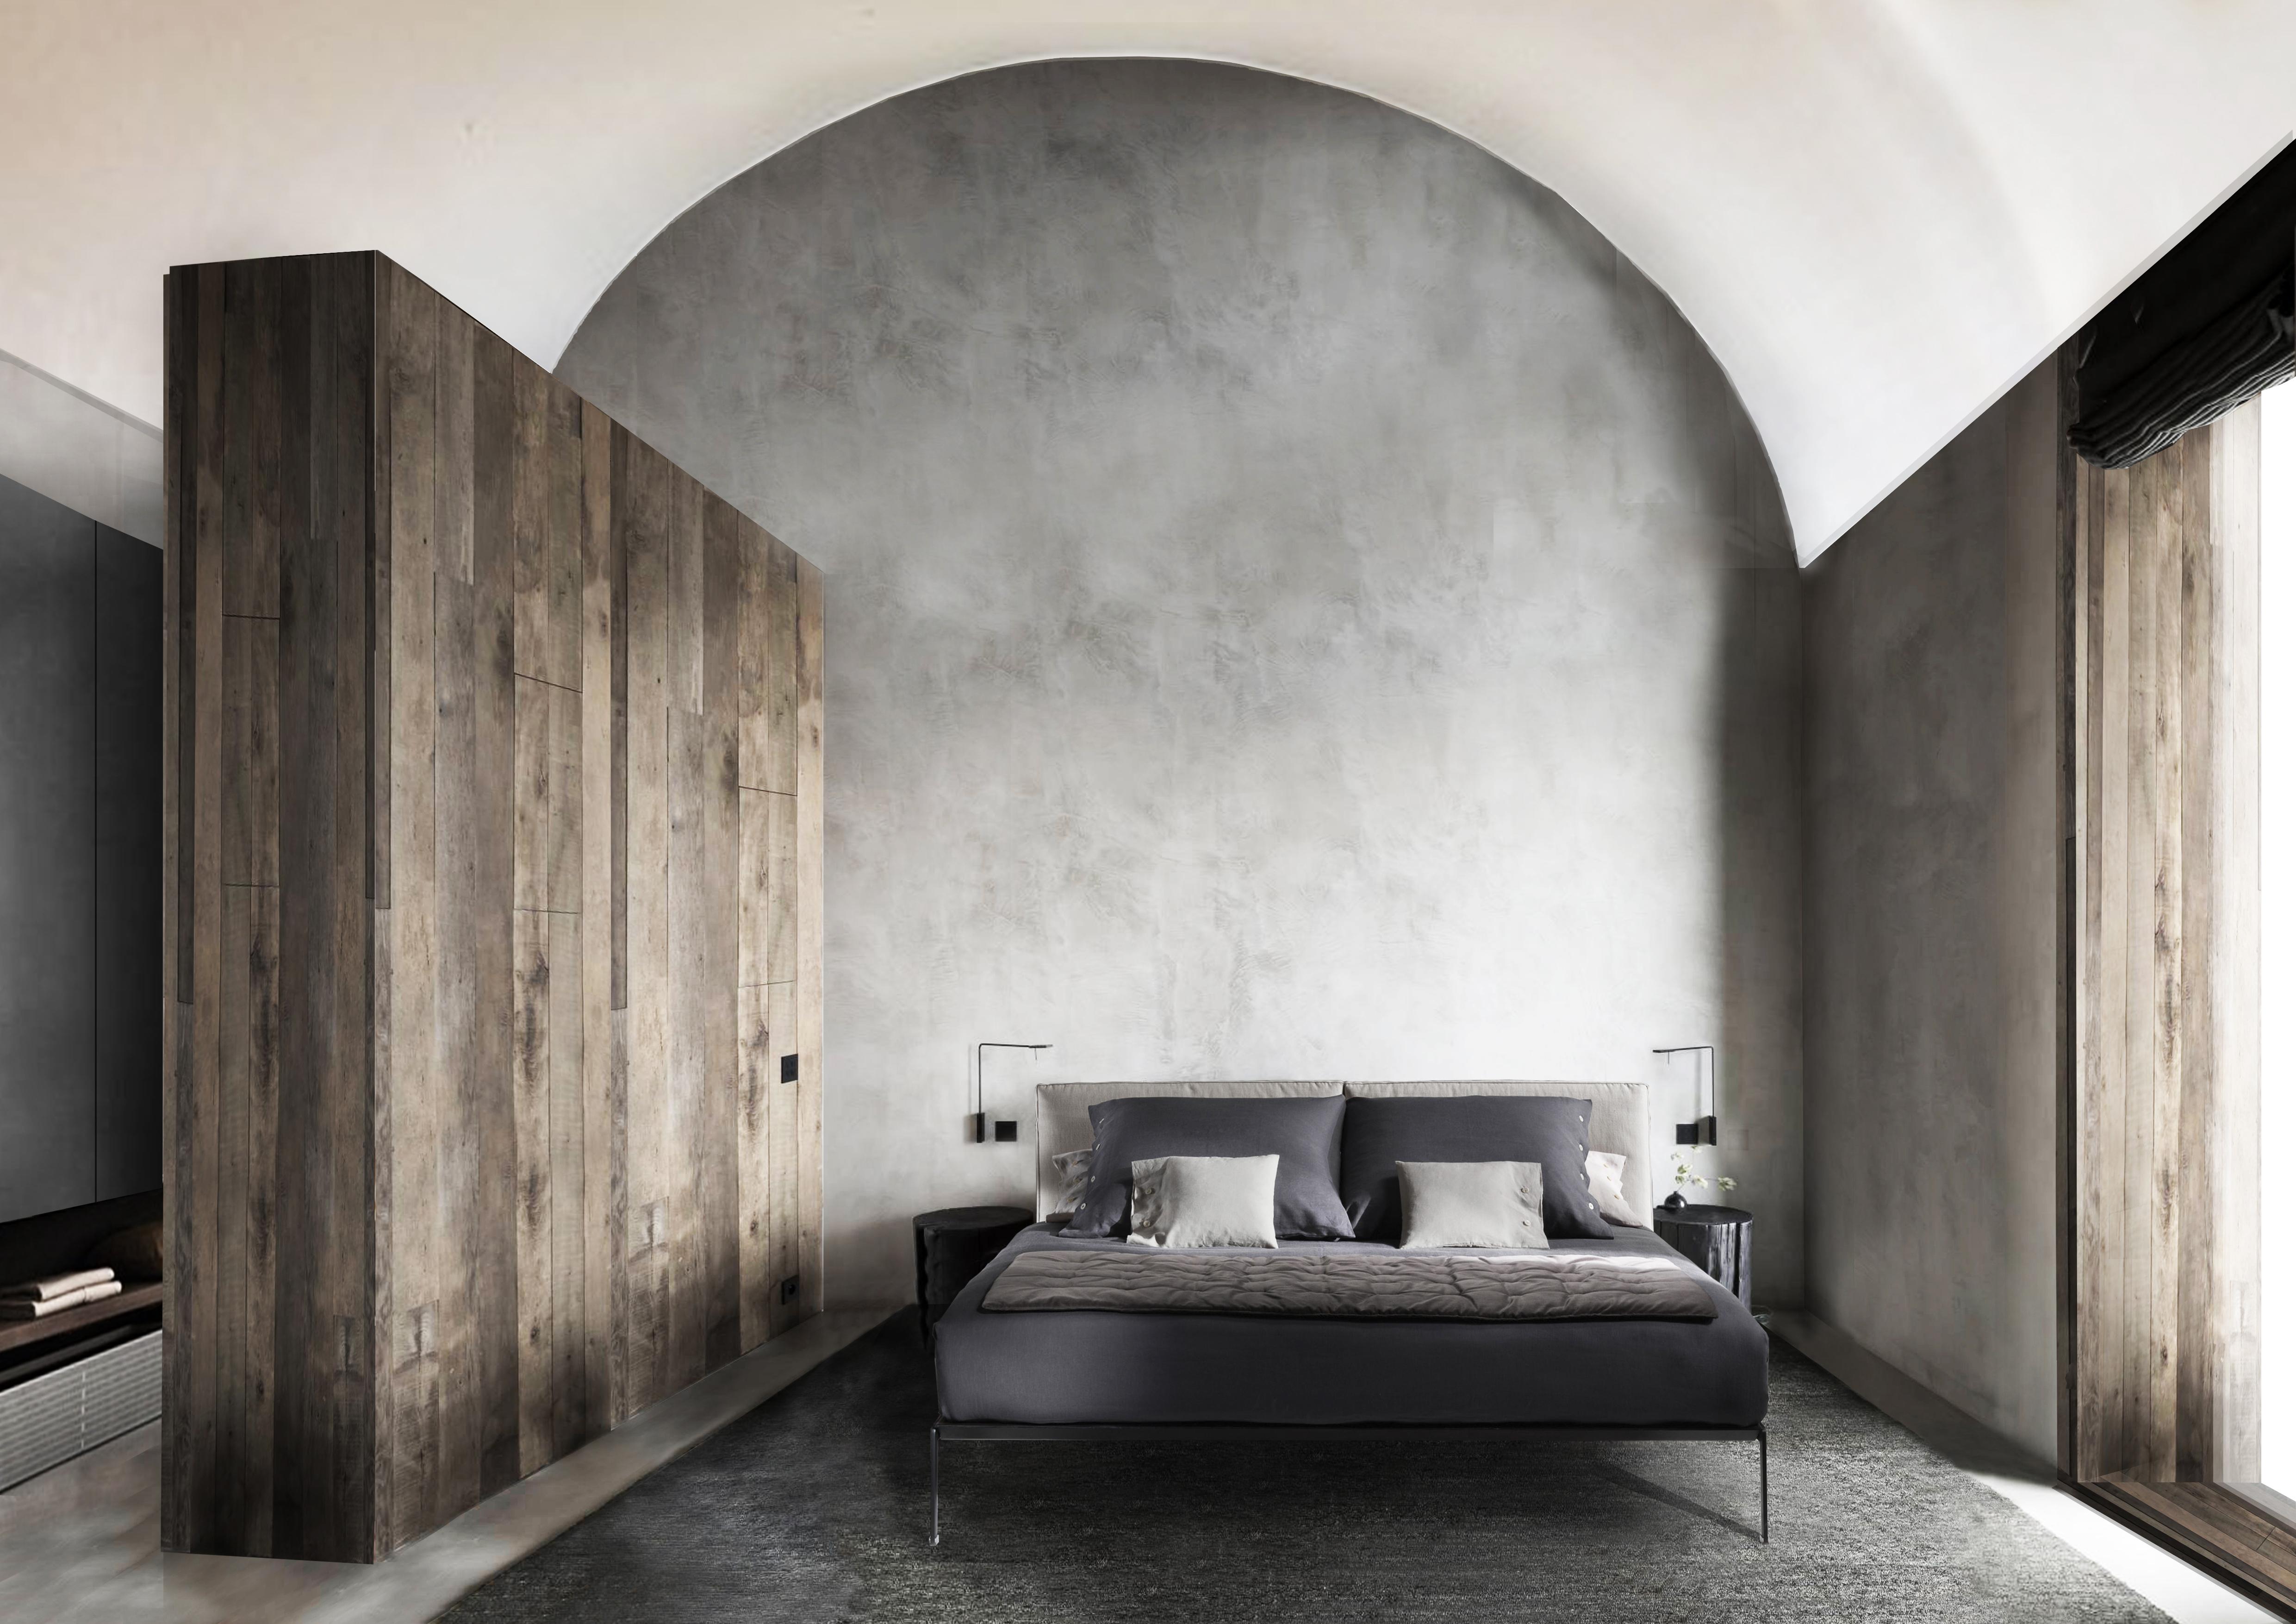 06_dormitorio